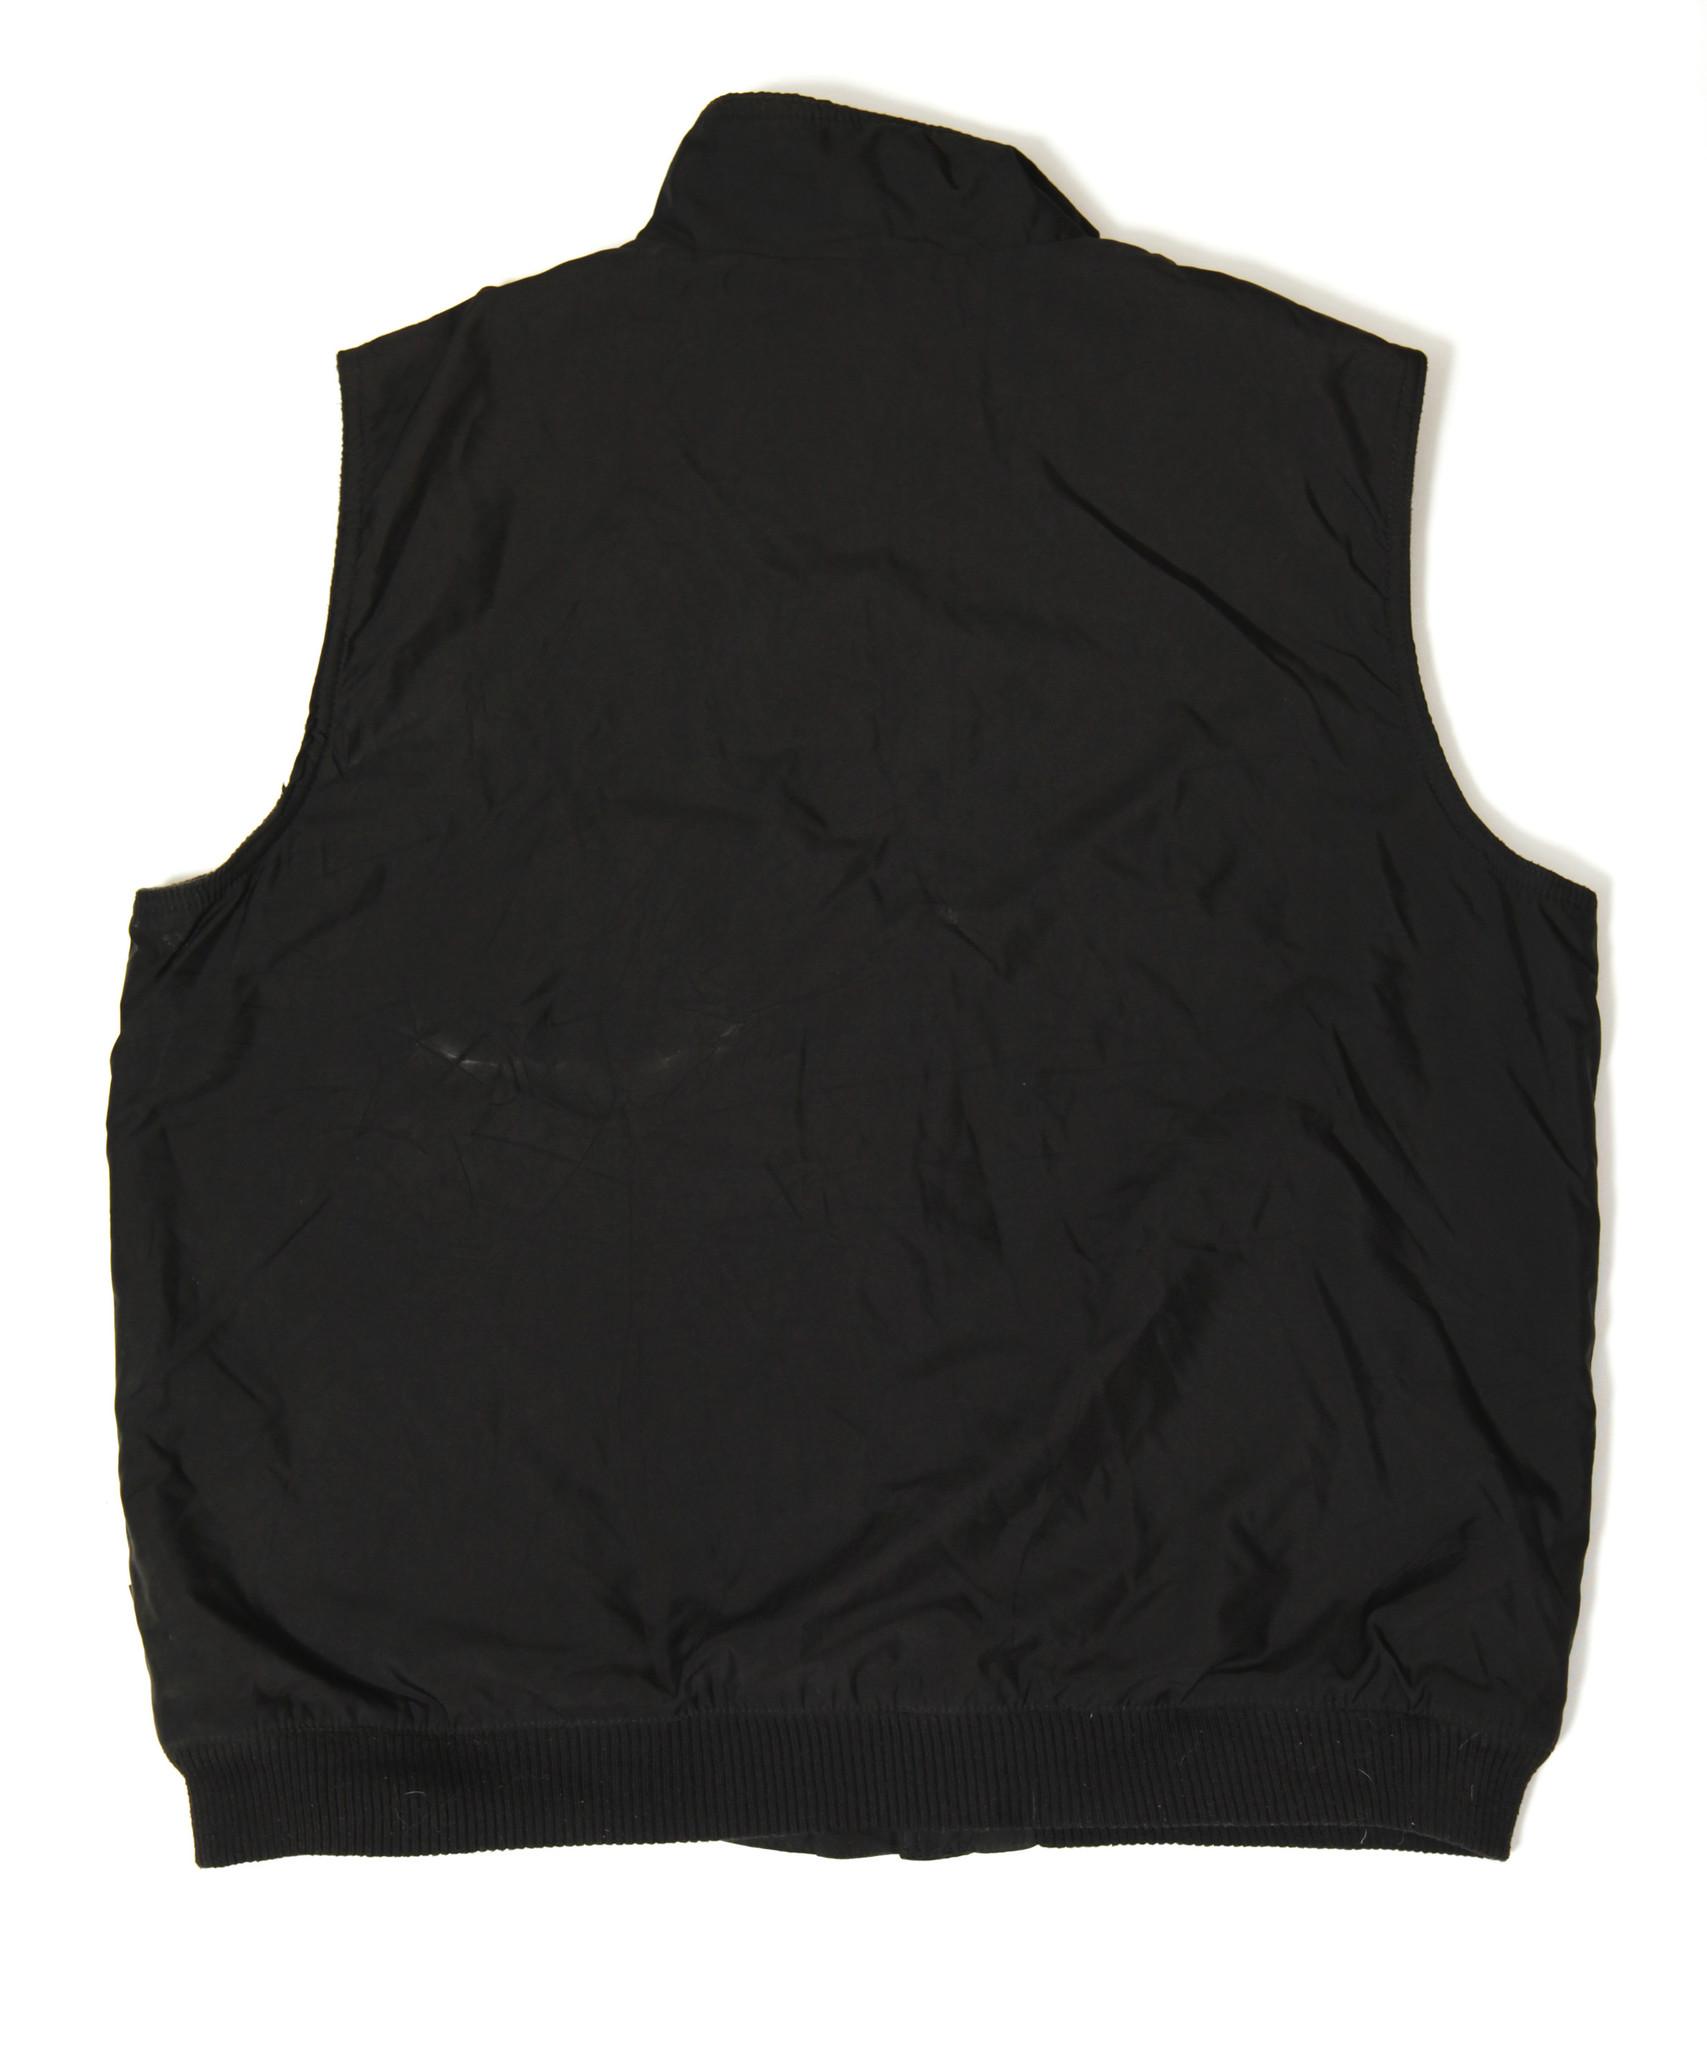 Black Chaps bodywarmer